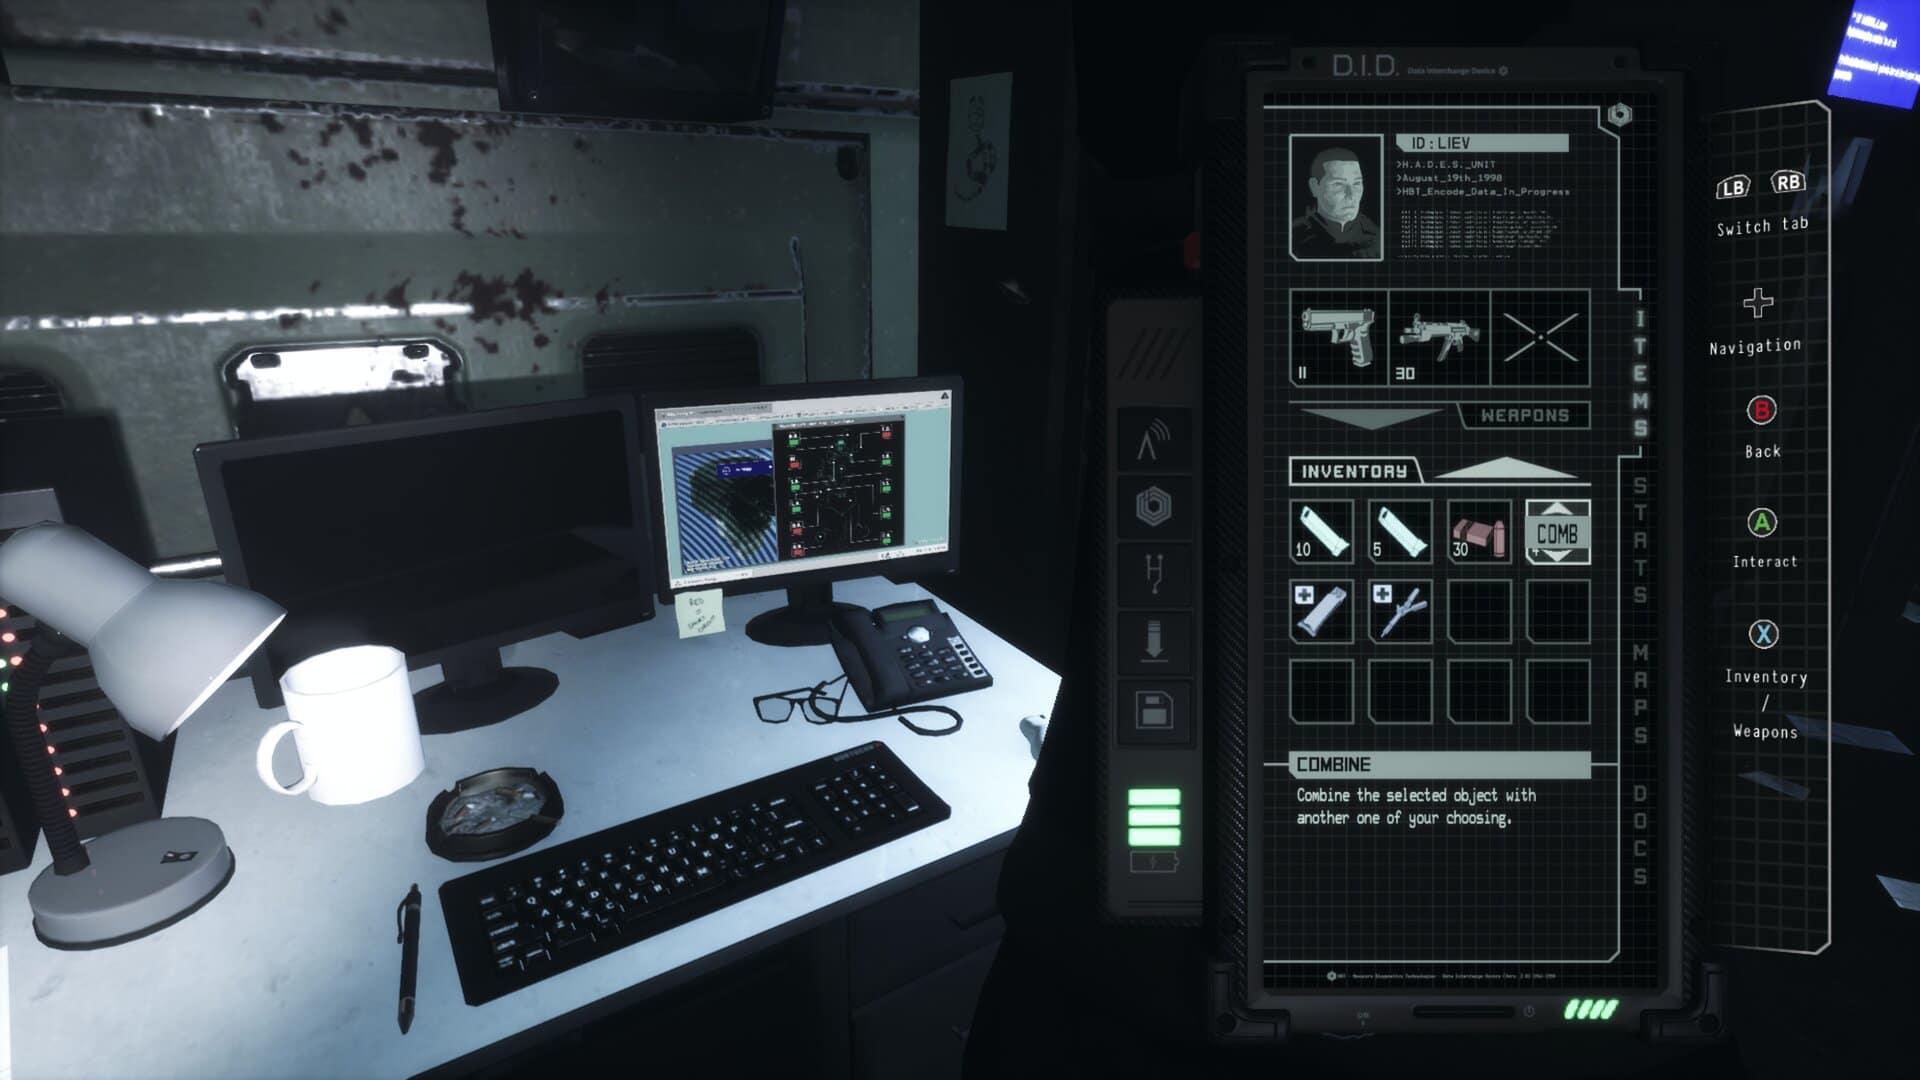 Análise Daymare, Destructive Creations, Invader Studios, Survival Horror, Delfos